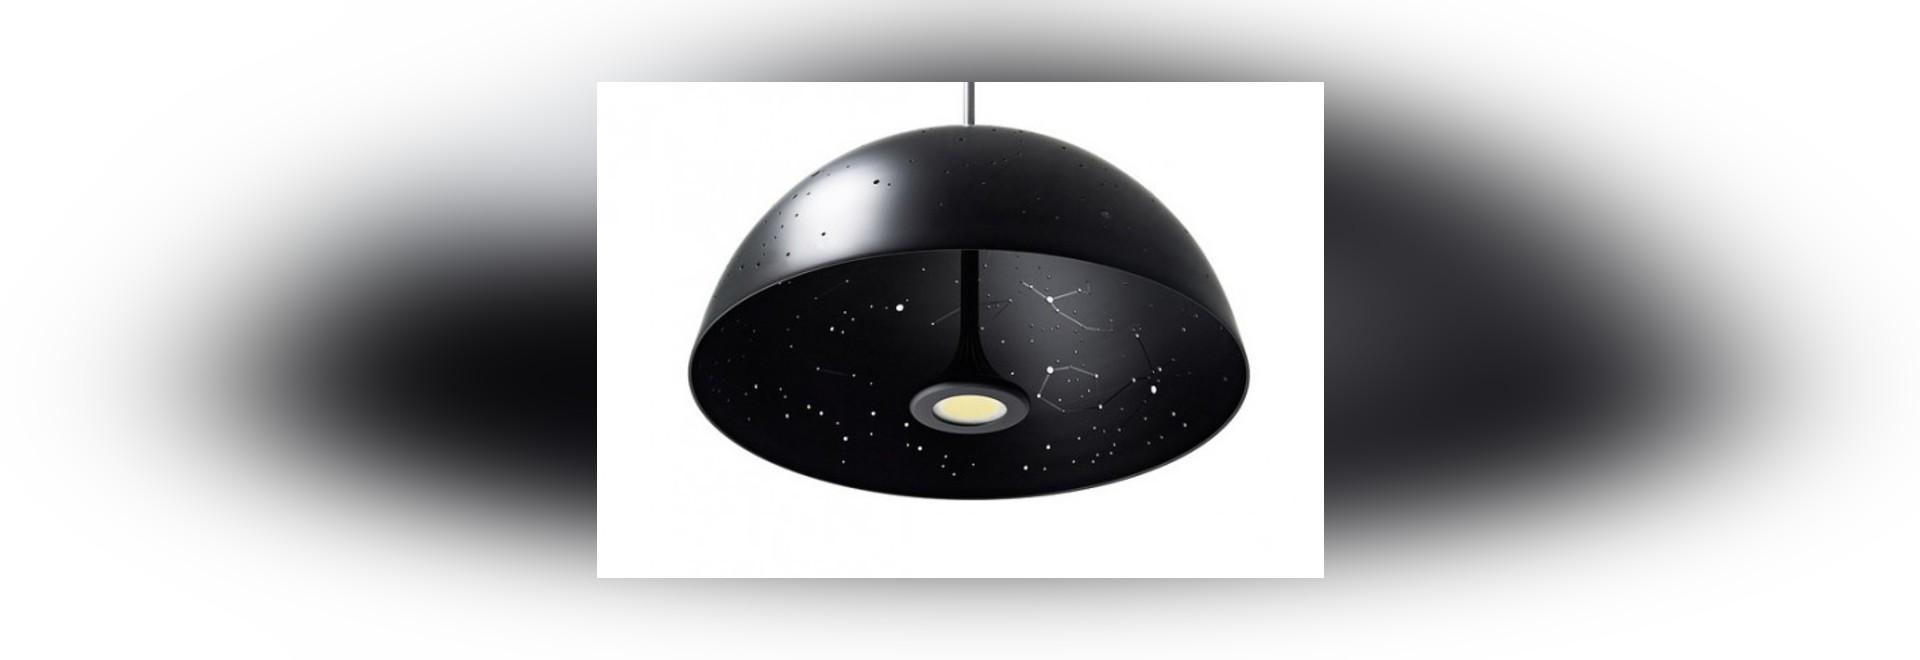 Soffitto Cielo Stellato Led: Ss112 +1 kit cielo stellato ...